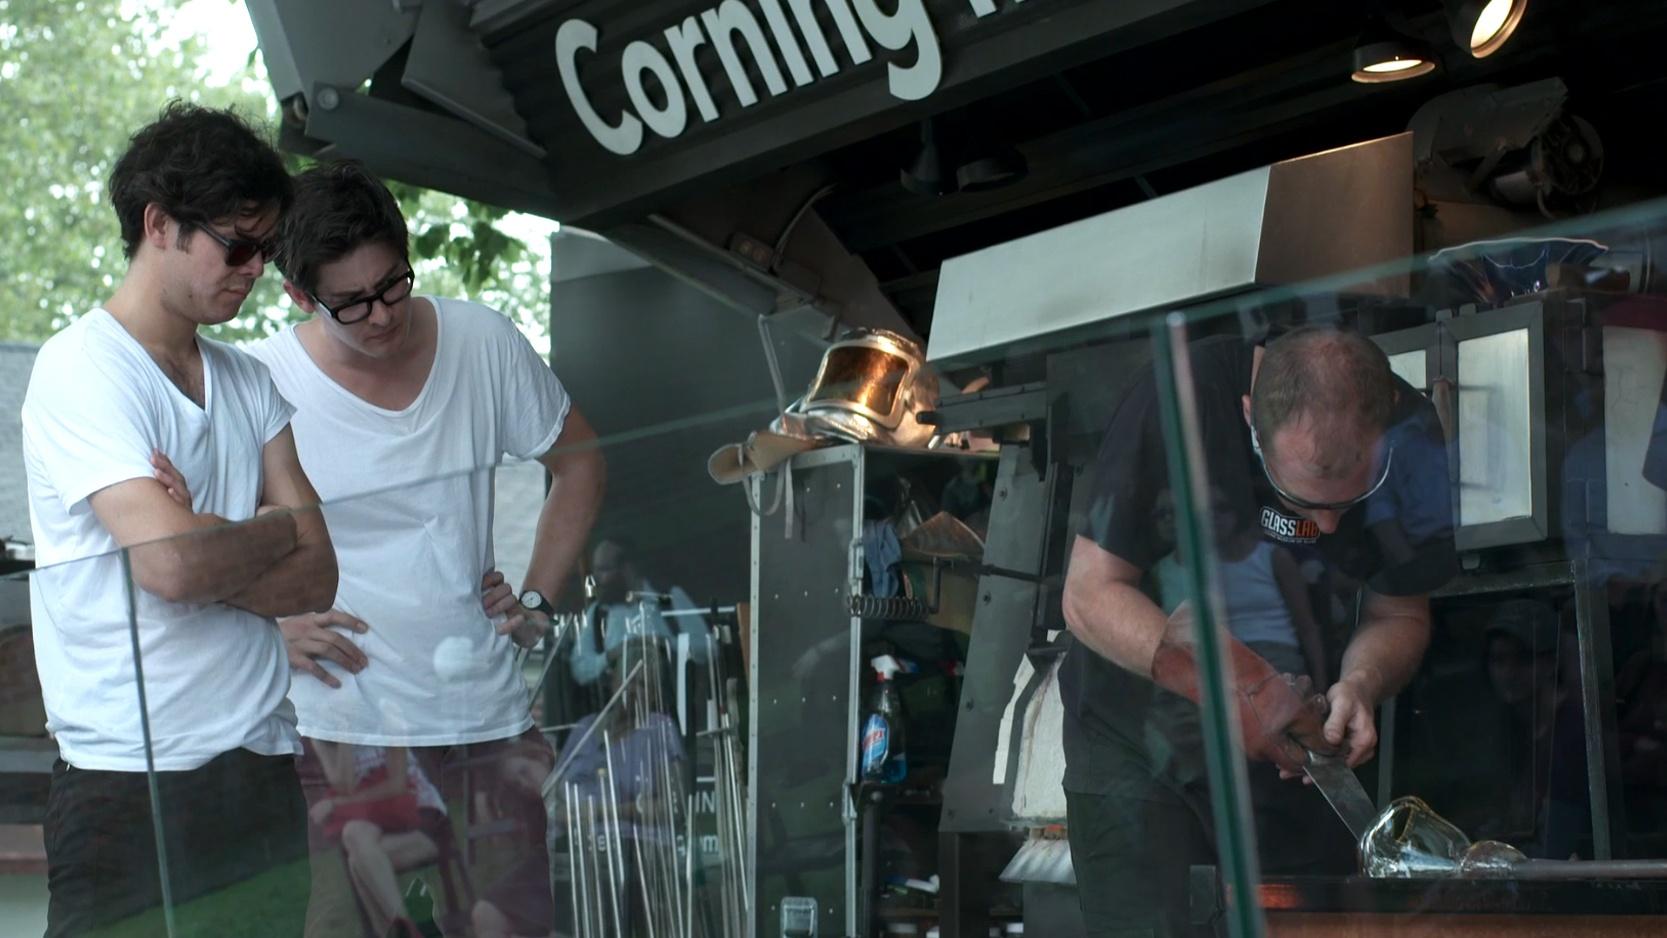 Chris Leong | Corning Museum of Glass